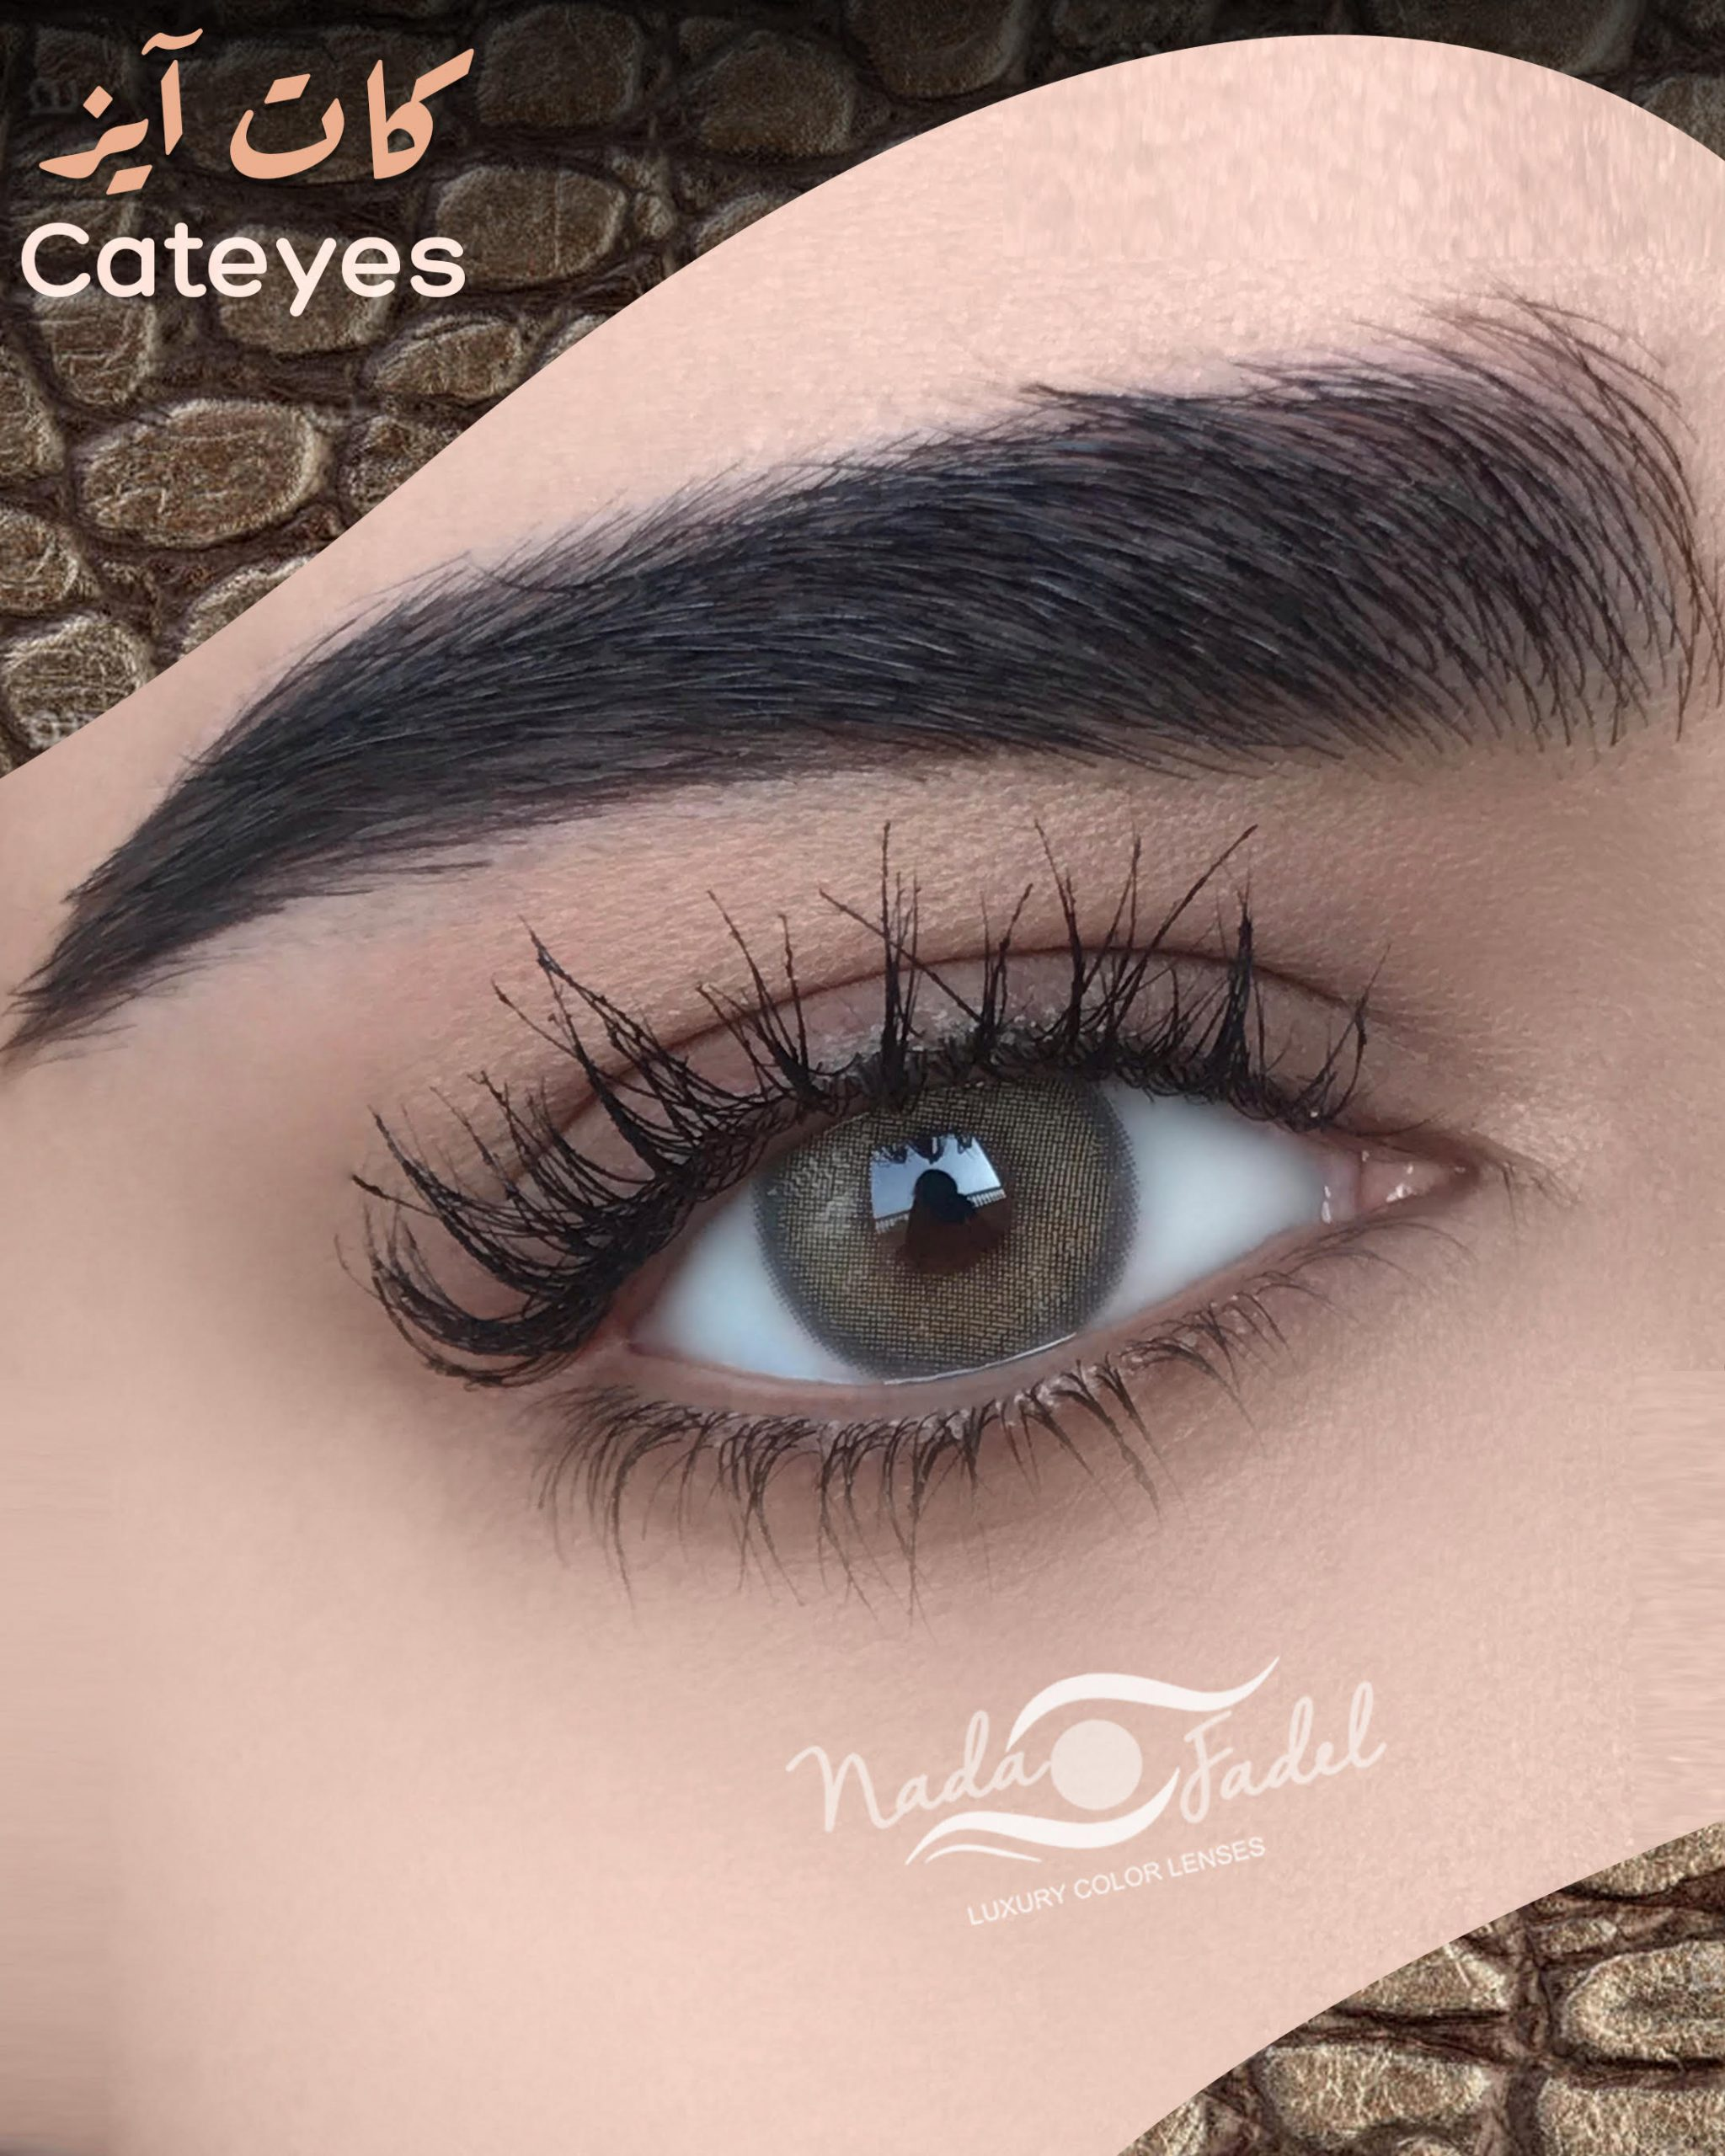 Cateyes